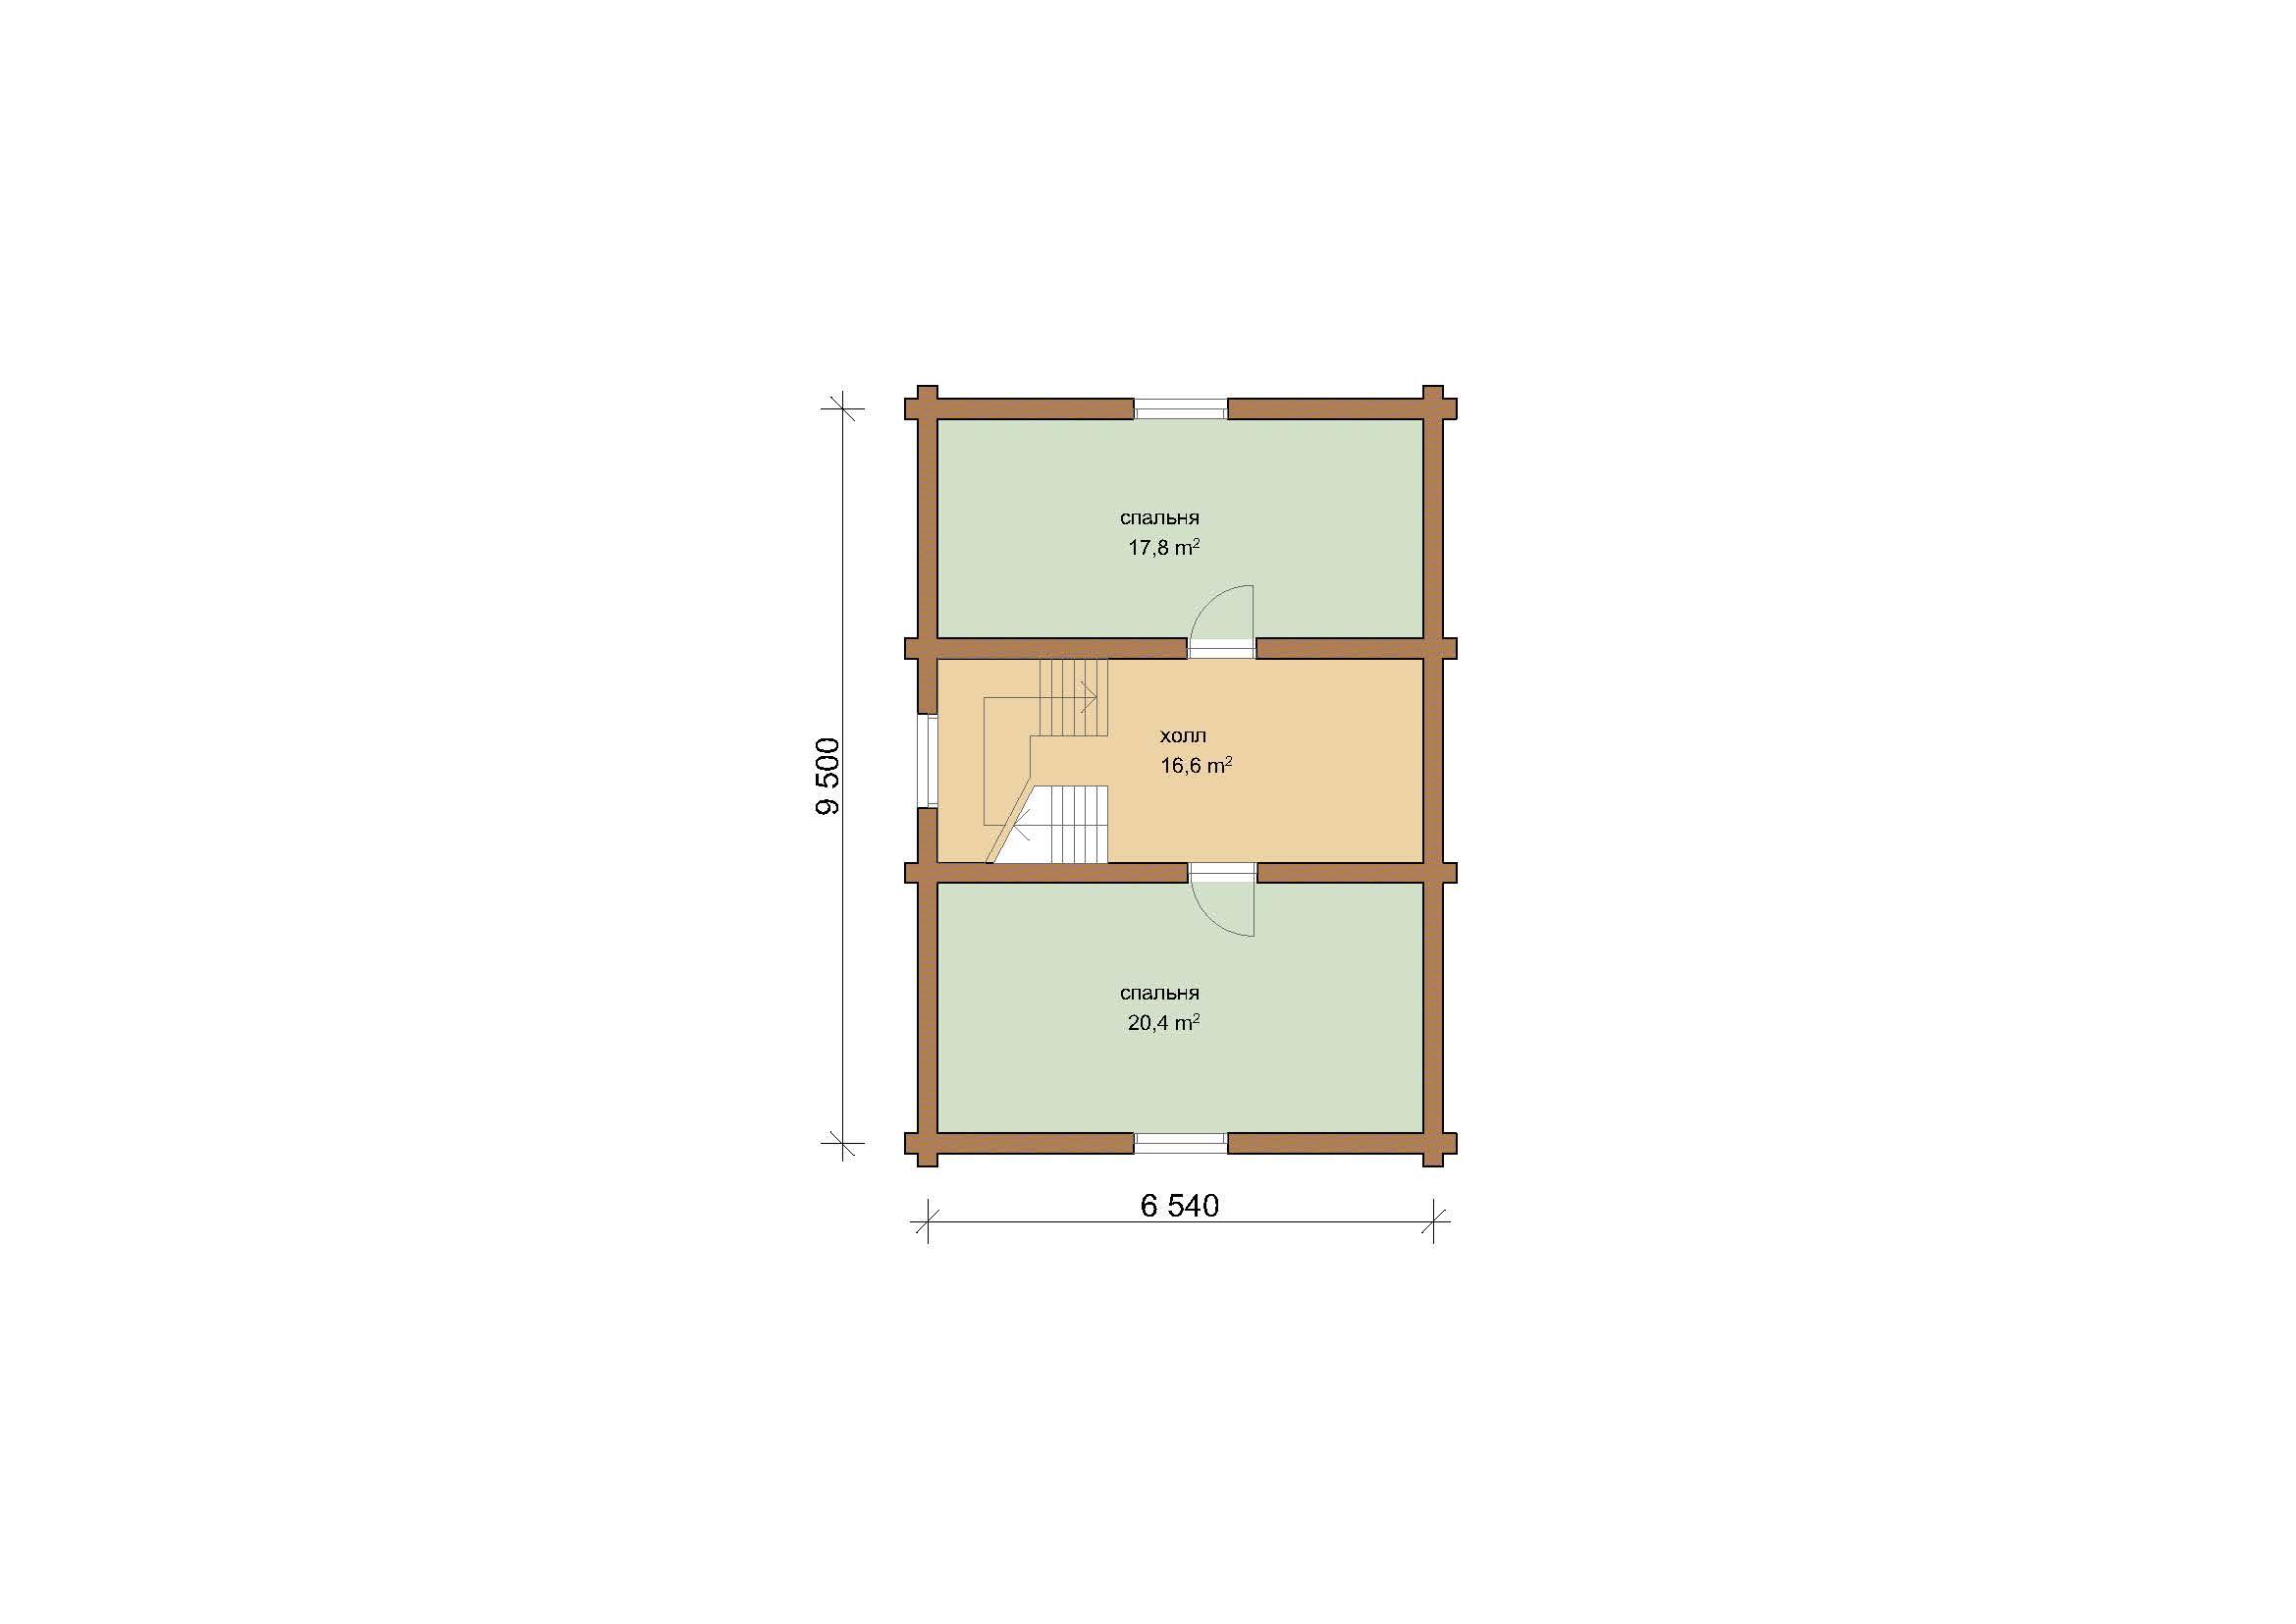 Дом 110.4 м2 8.14х9.5 по проекту ГОЛИЦИНО план